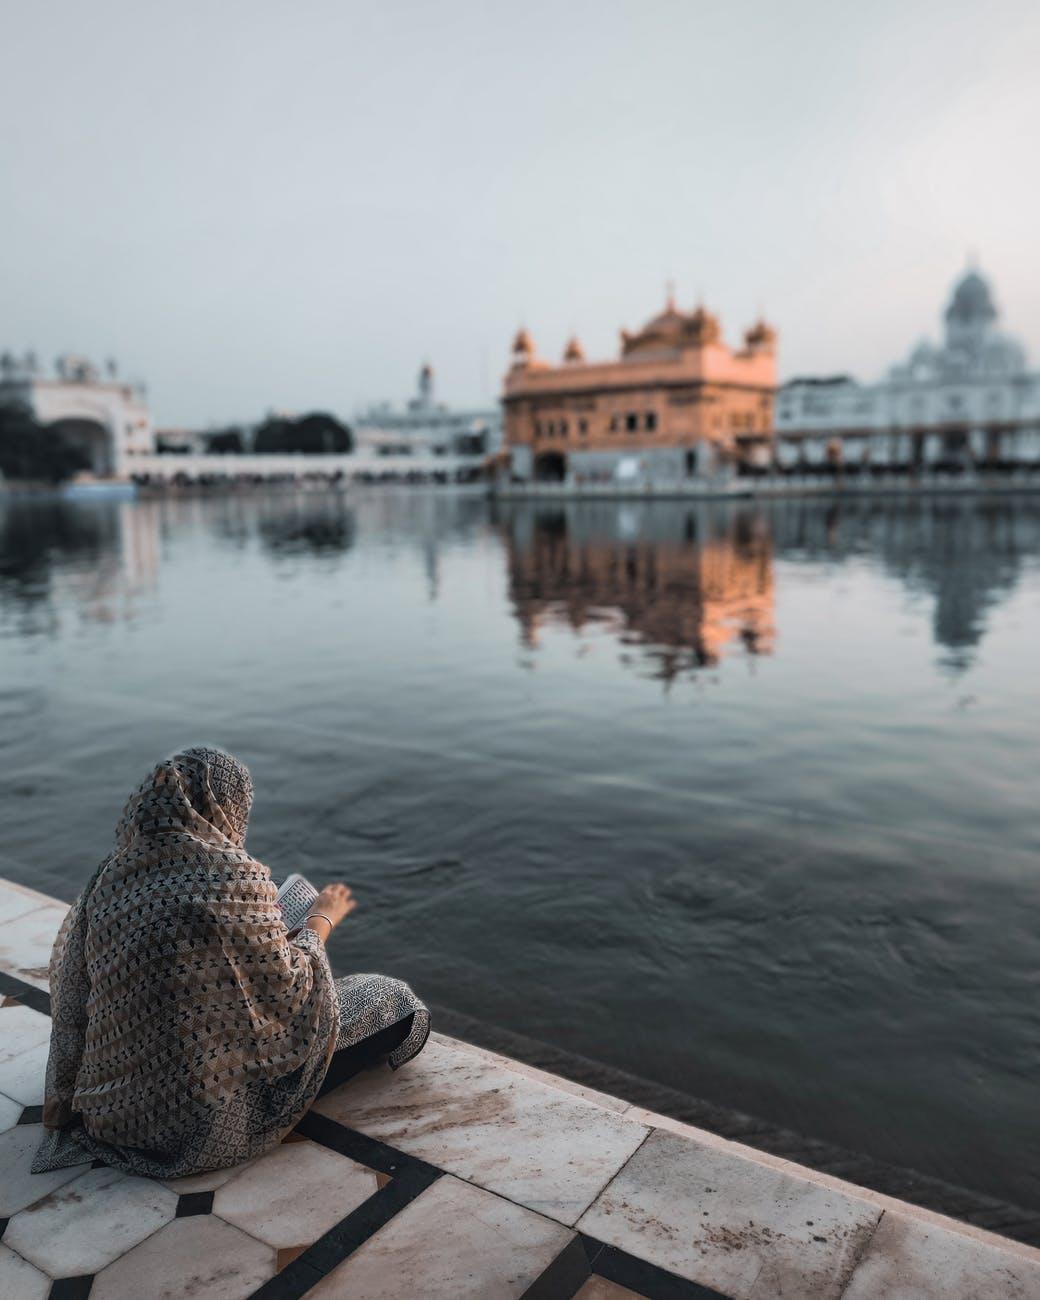 unrecognizable woman sitting near pond